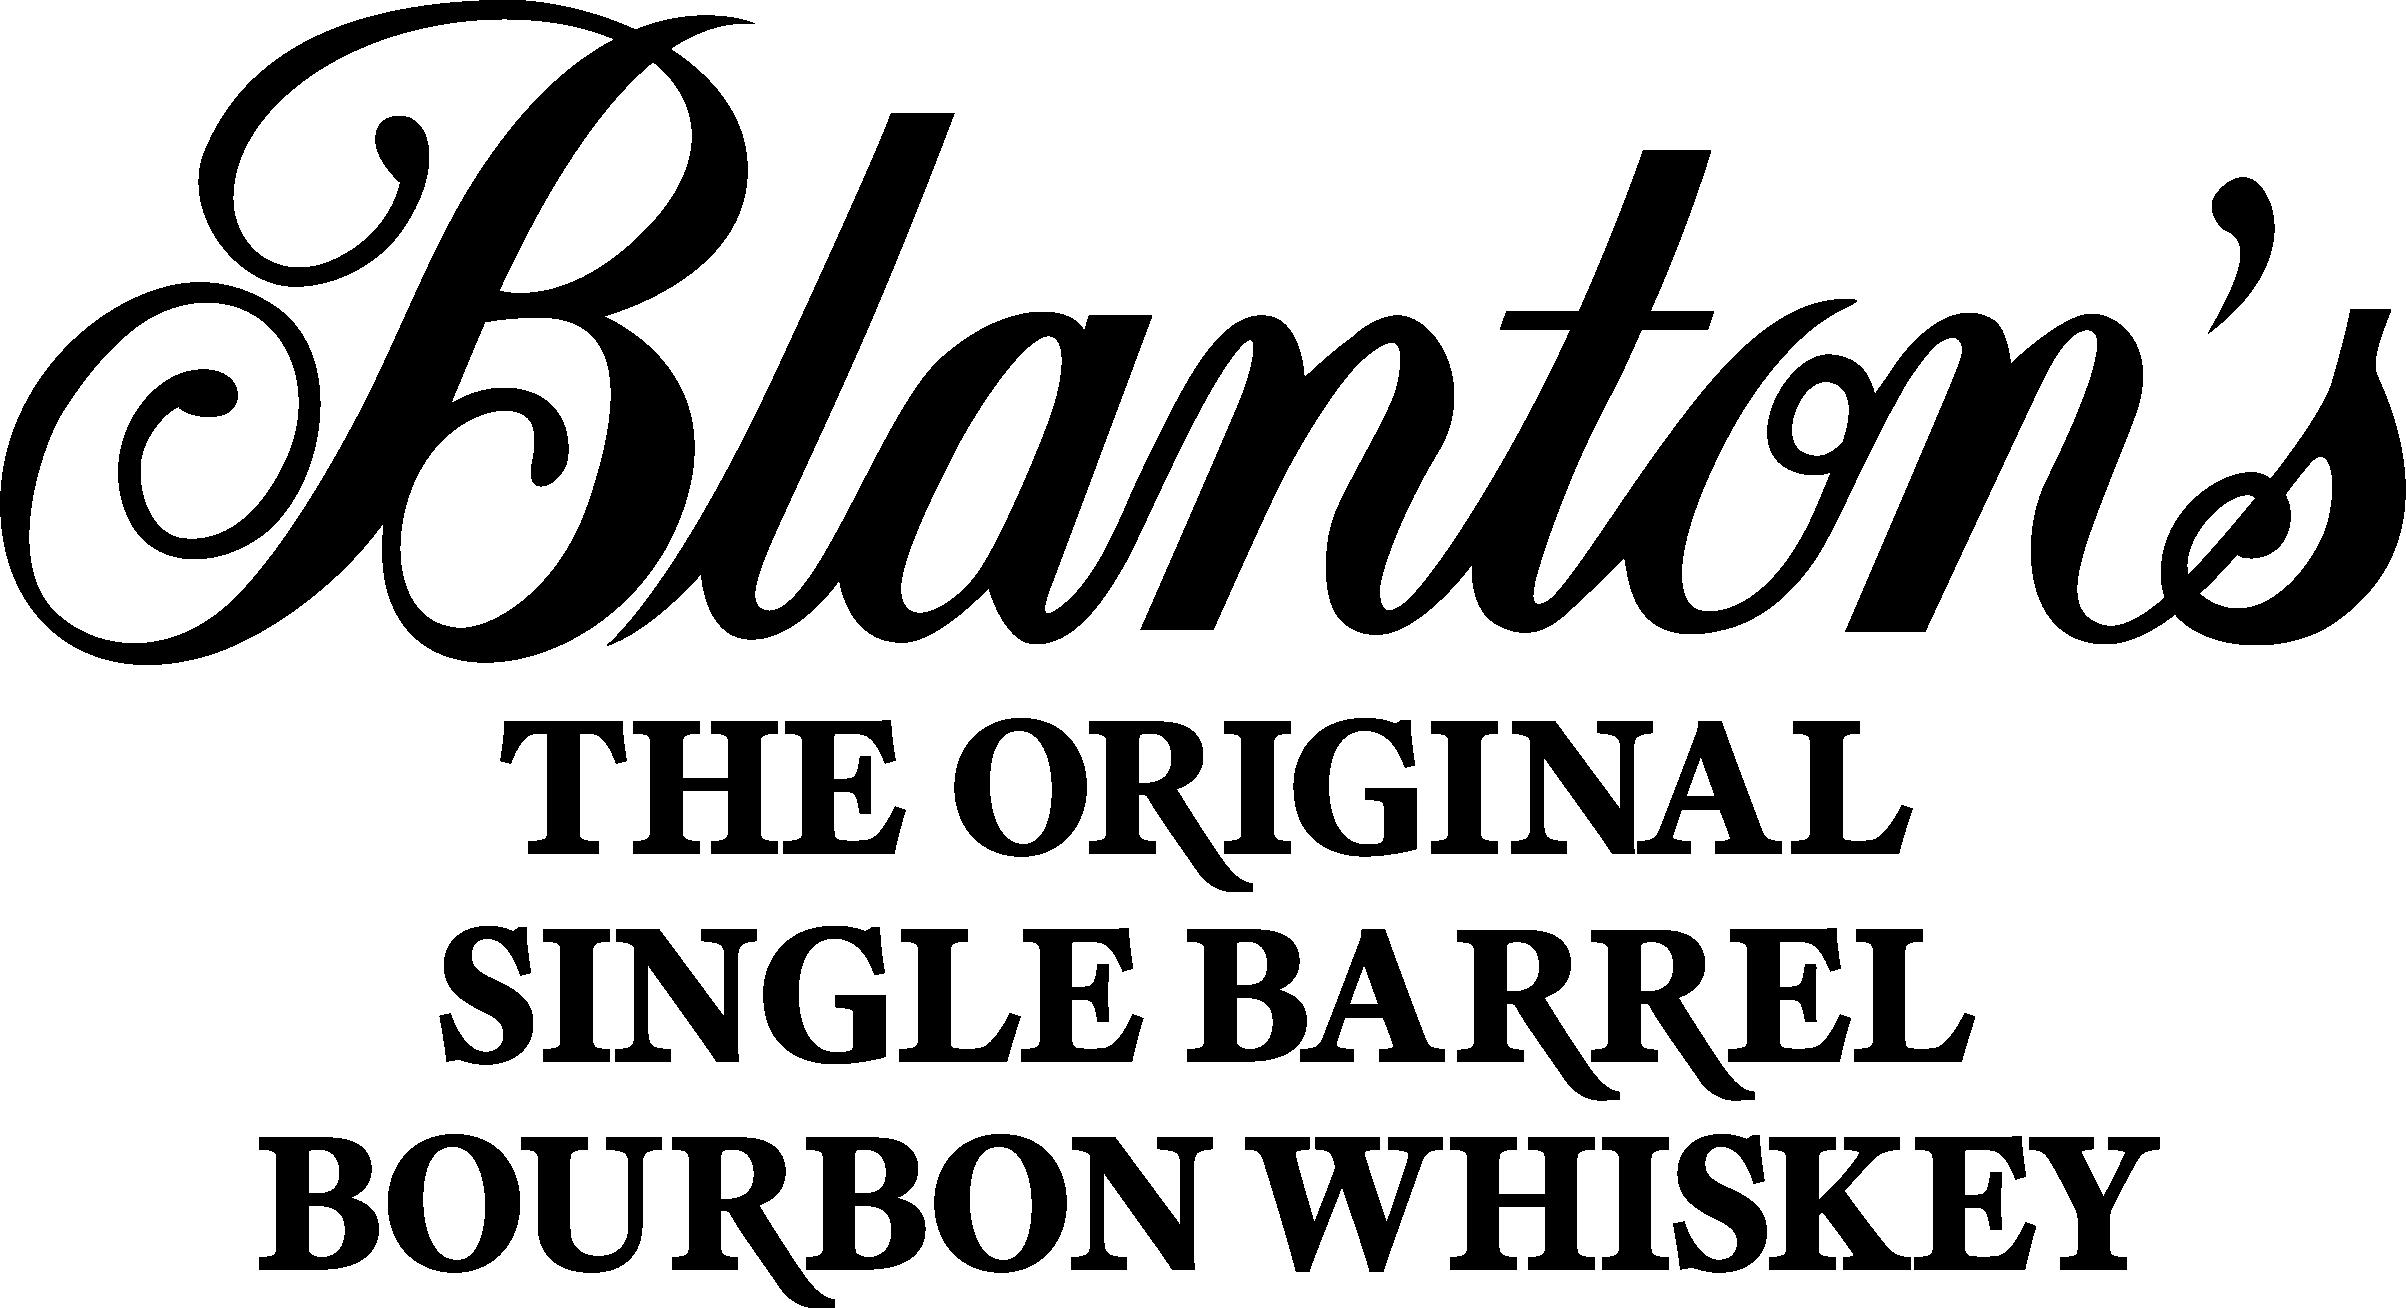 Blantons_Logo_Black_ORIGINAL_SINGLE_BARREL_WHISKEY